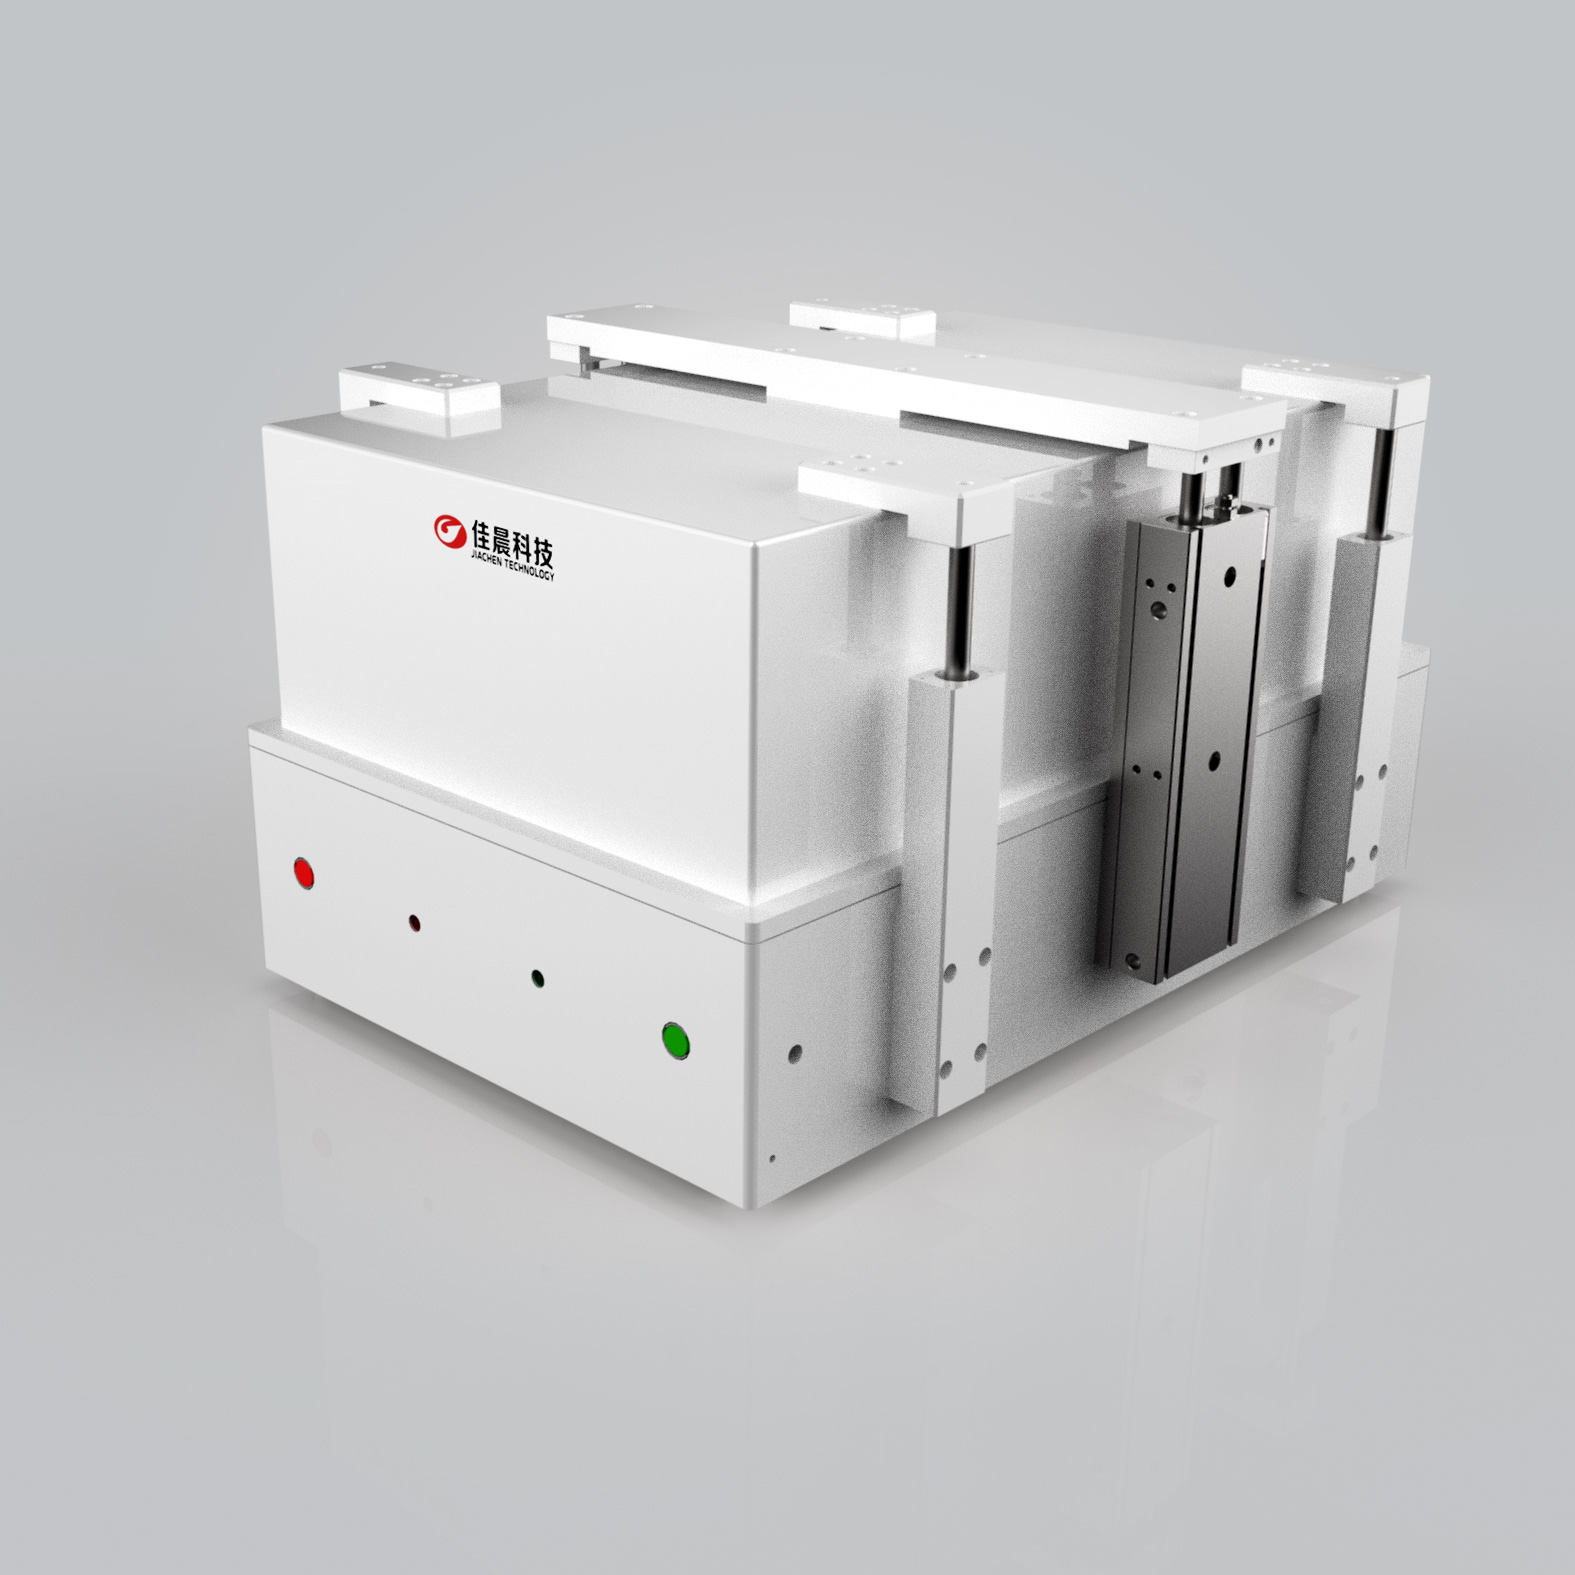 JC-PZ3809垂直式自动屏蔽箱0.2x0.4x0.2